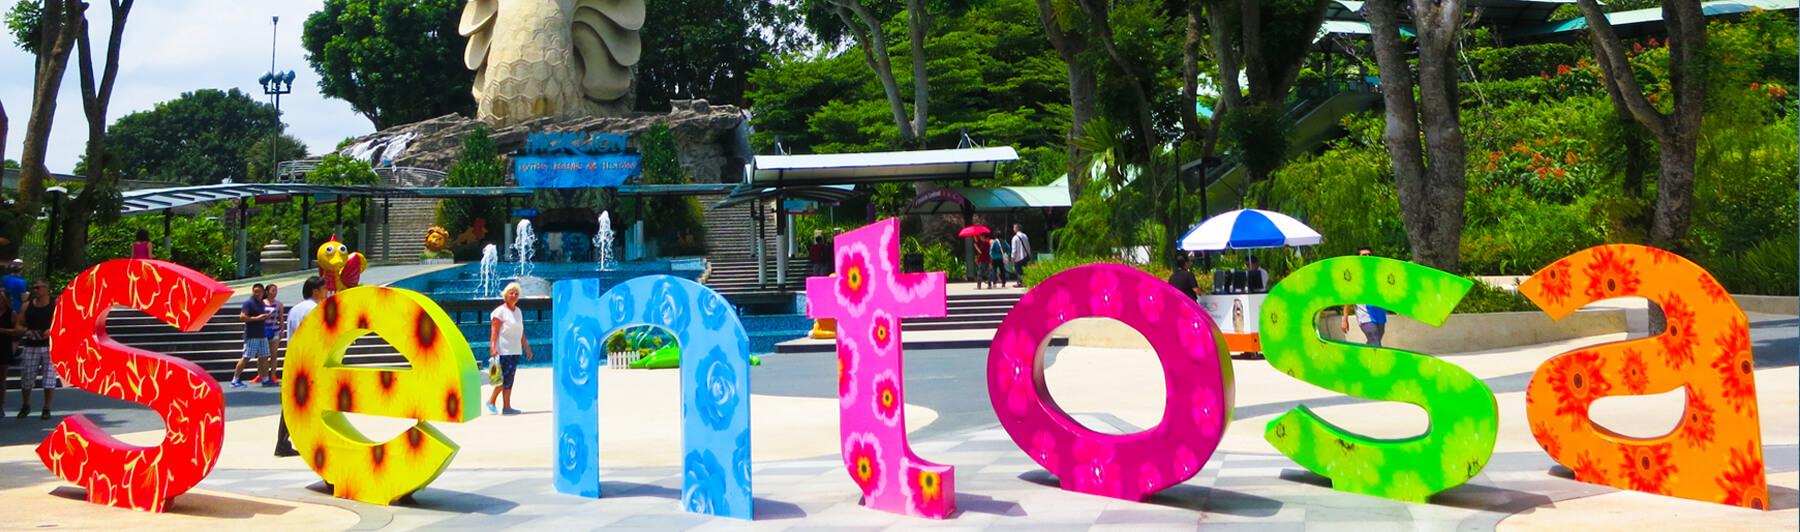 Sentosa Island, Singapore